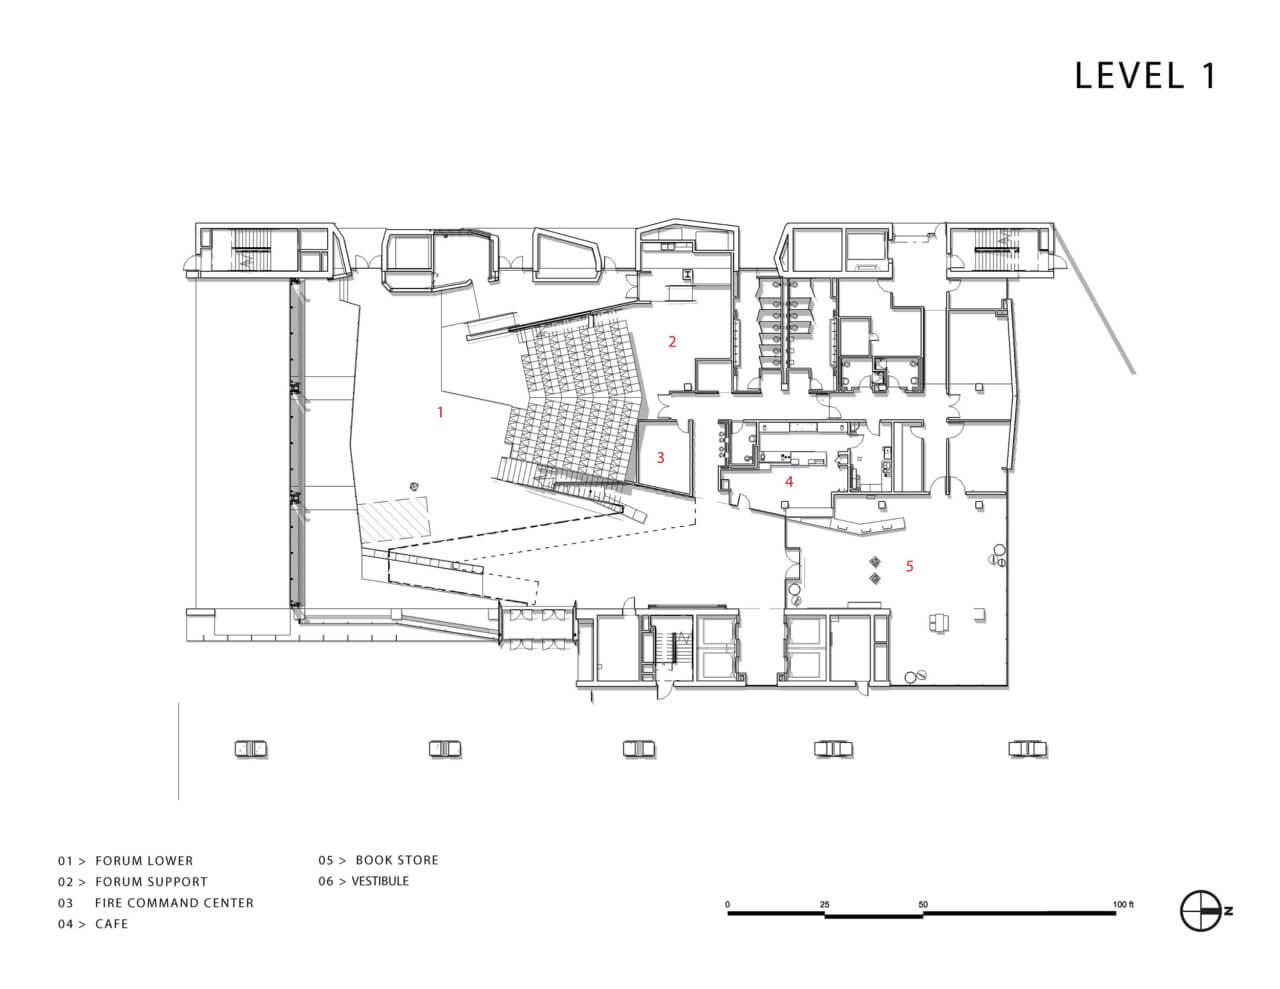 45_CO_Tucson-HSIB_Floorplan_Level-1-1280x989